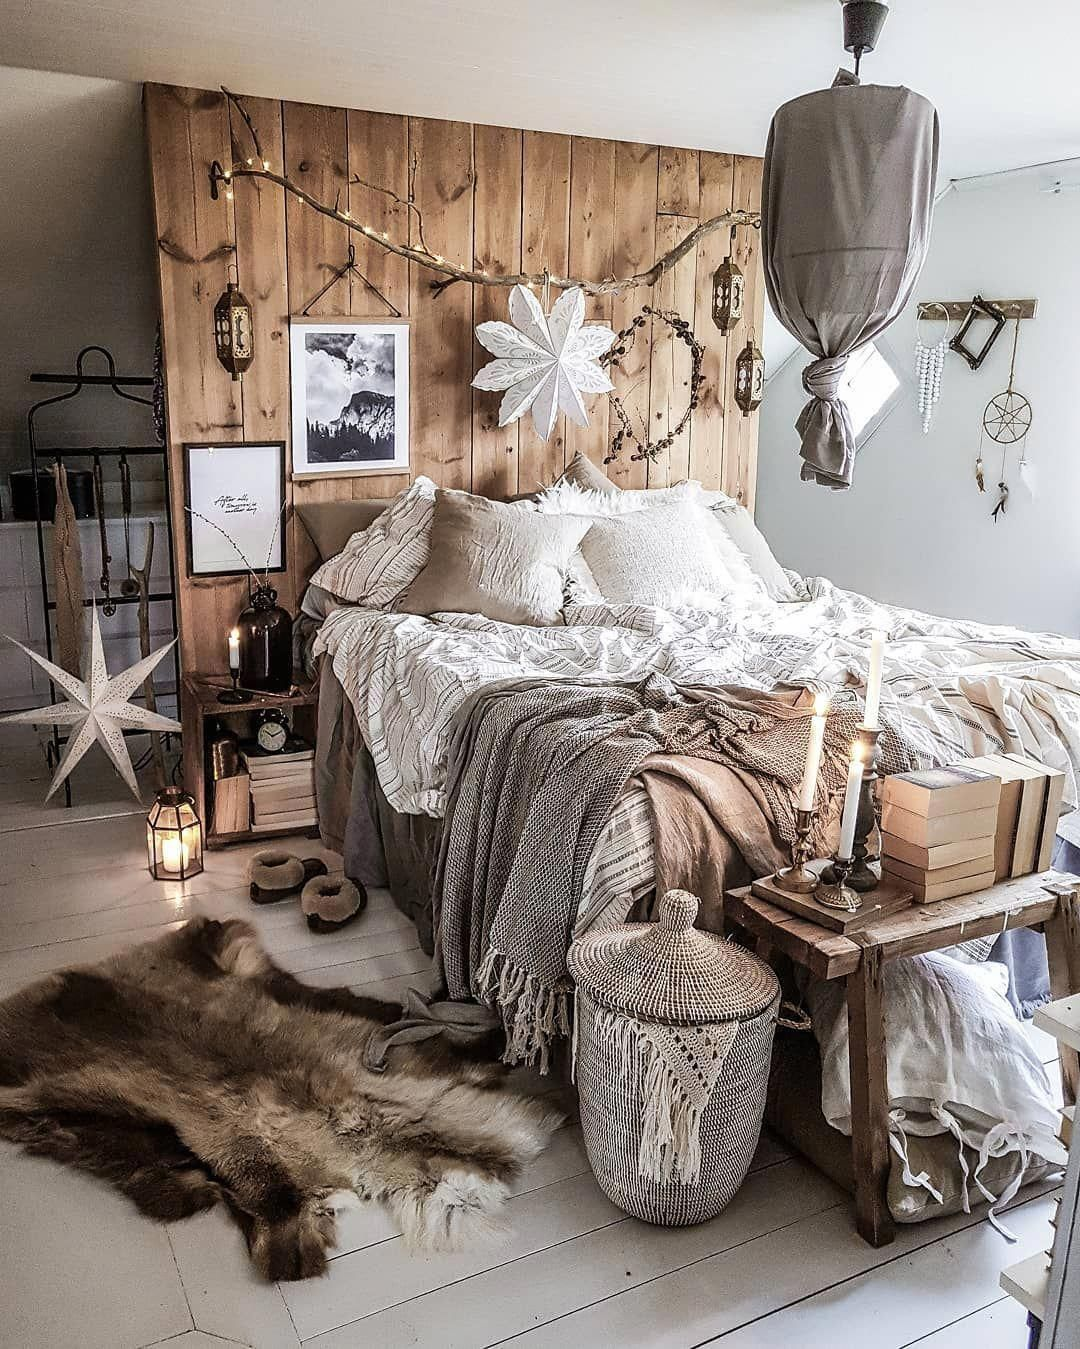 What   hot on pinterest bohemian interior design ideas also rh